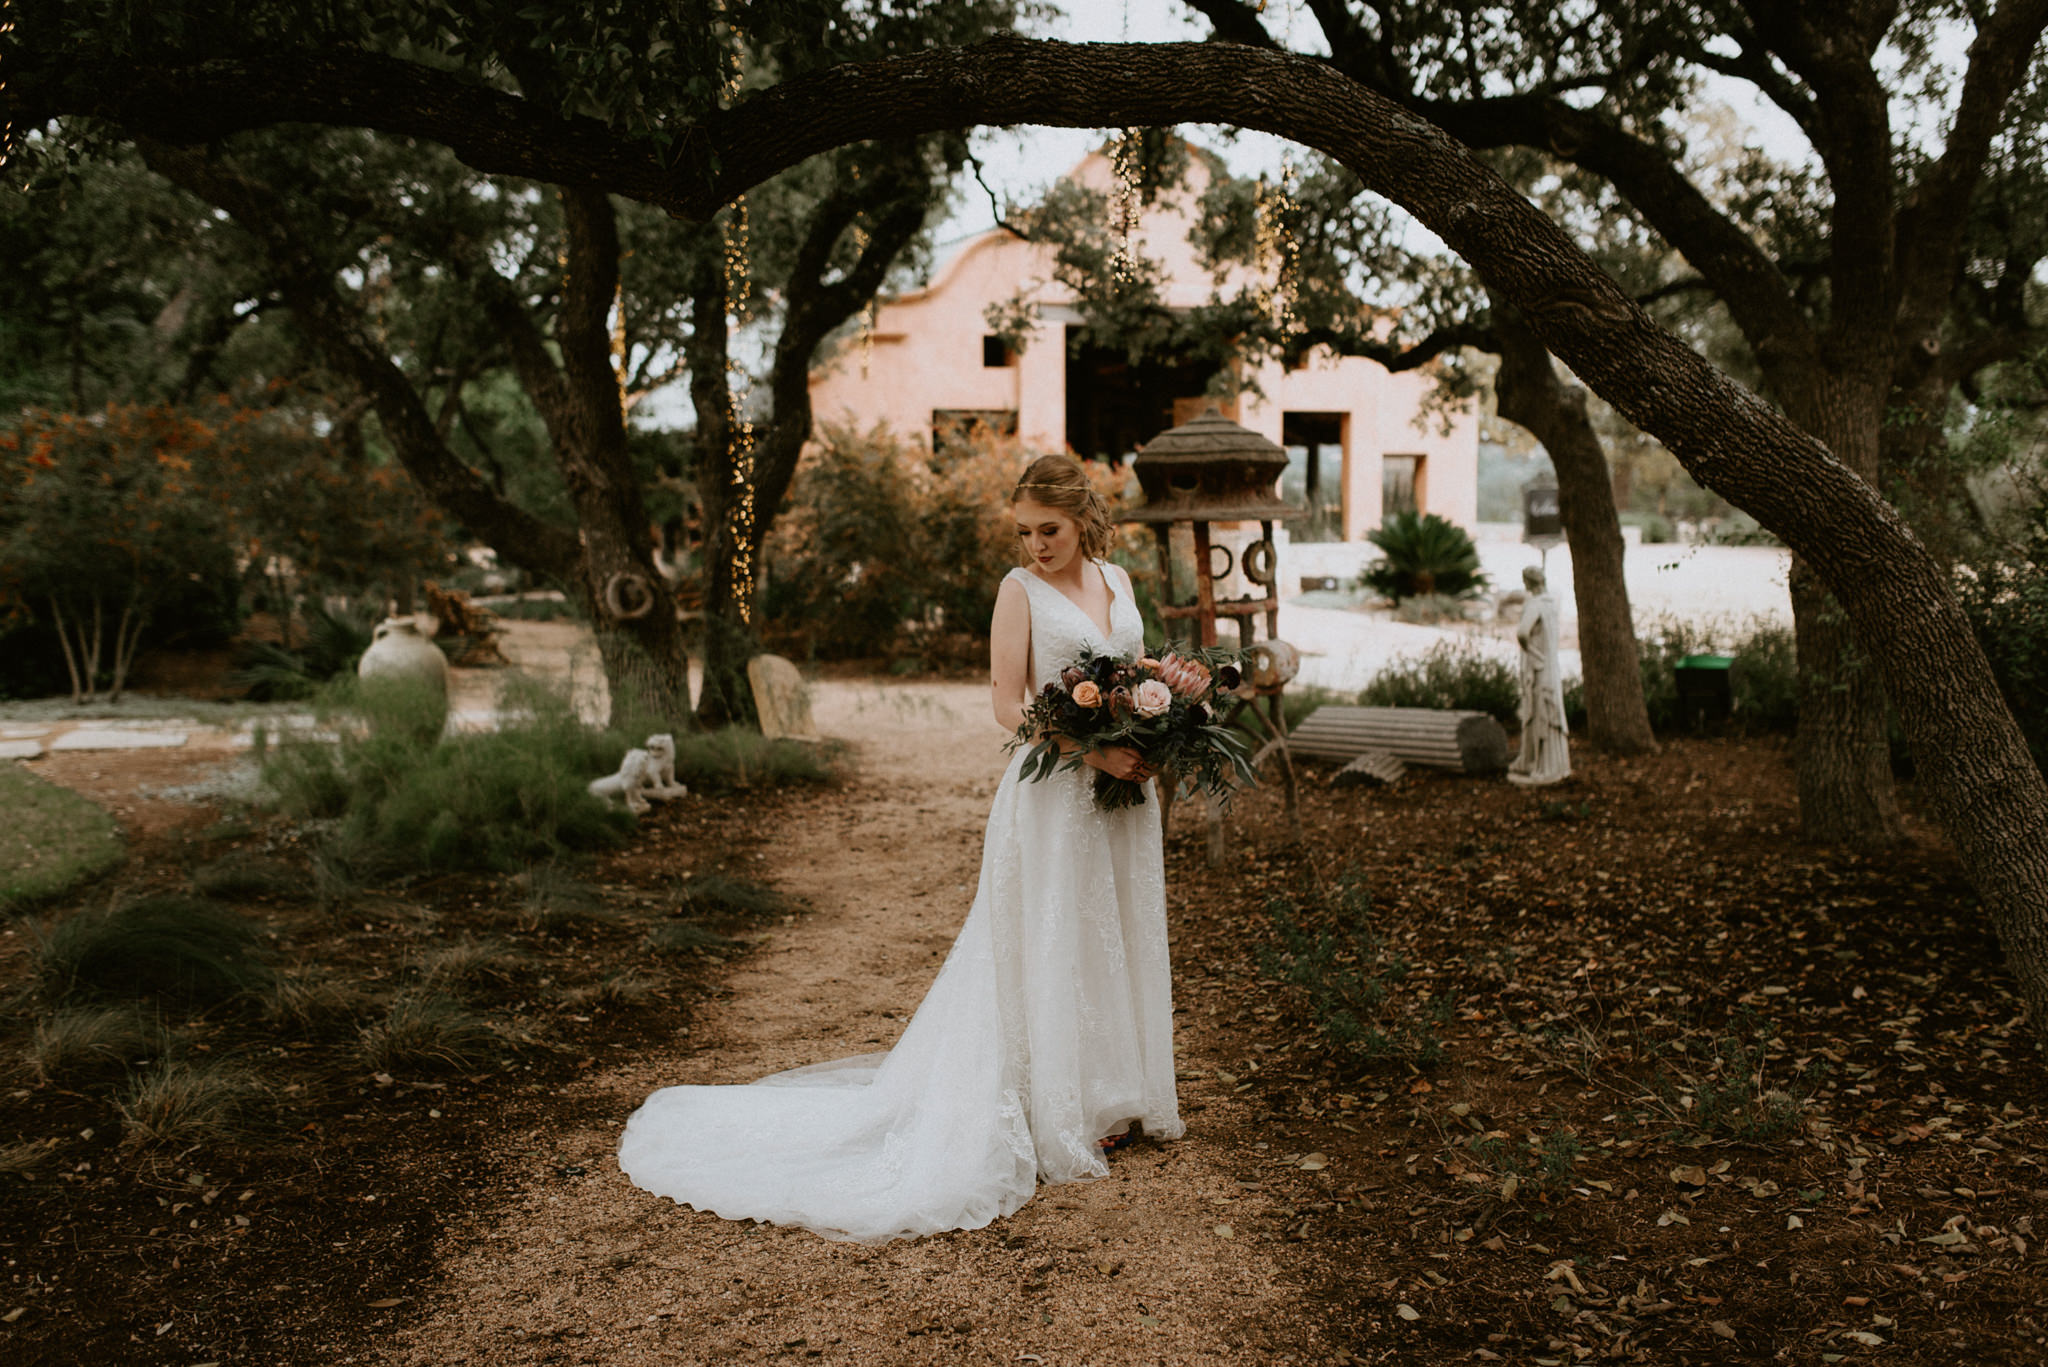 Kerlyn-Van-Gelder-Photography-Corpus-Christi-Photographer410.jpg